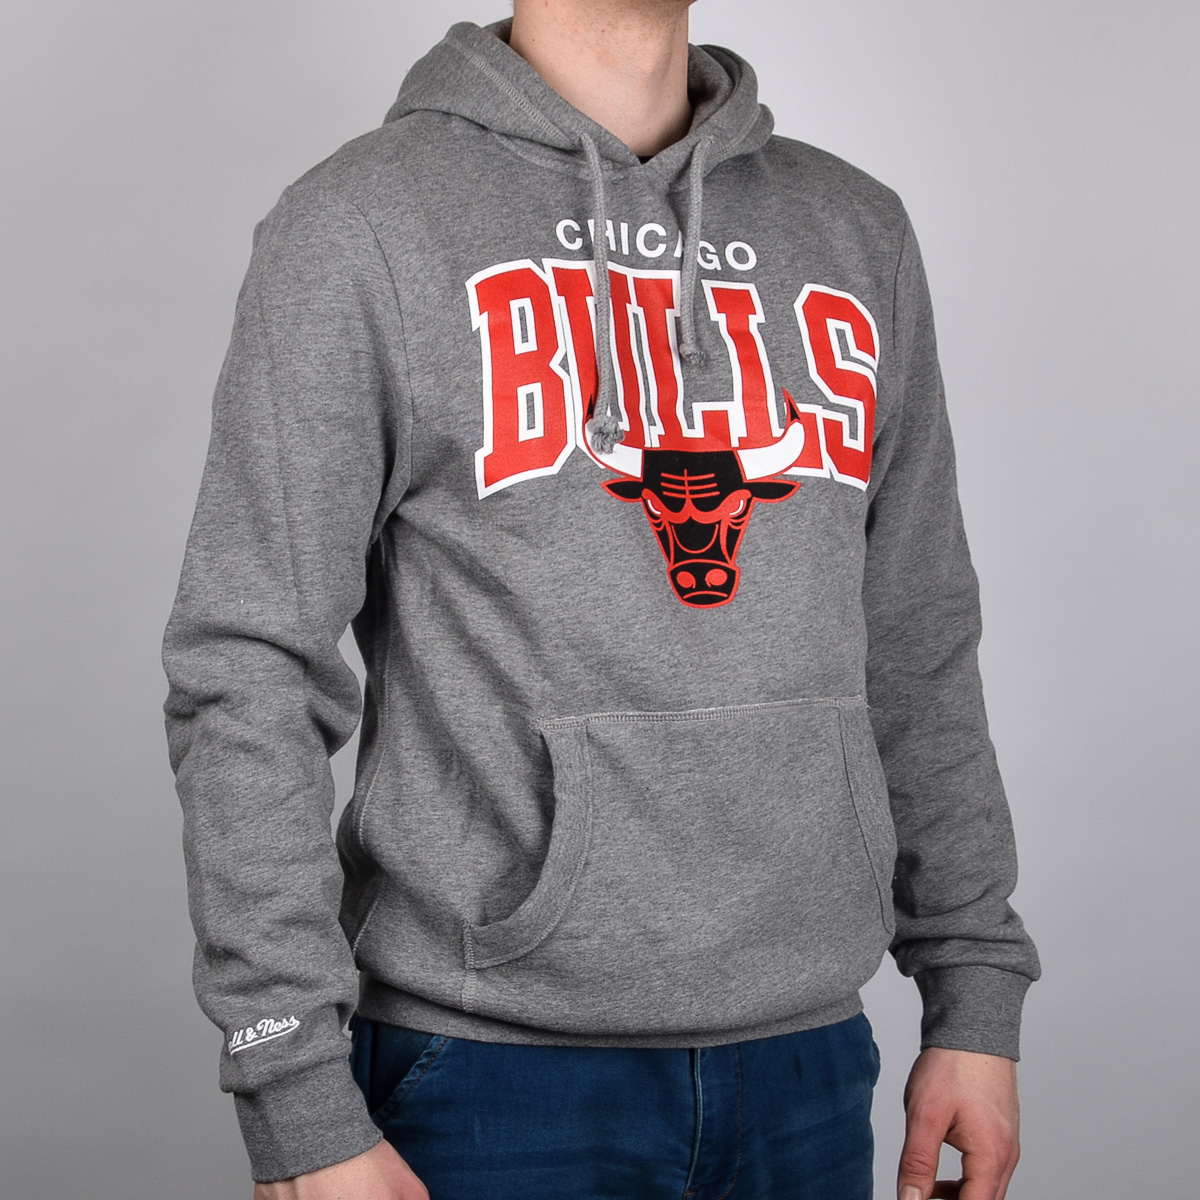 32c810ad955 Mitchell   Ness Chicago Bulls Team Arch Hoody - NBA Shop Chicago Bulls  Merchandise - Superfanas.lt